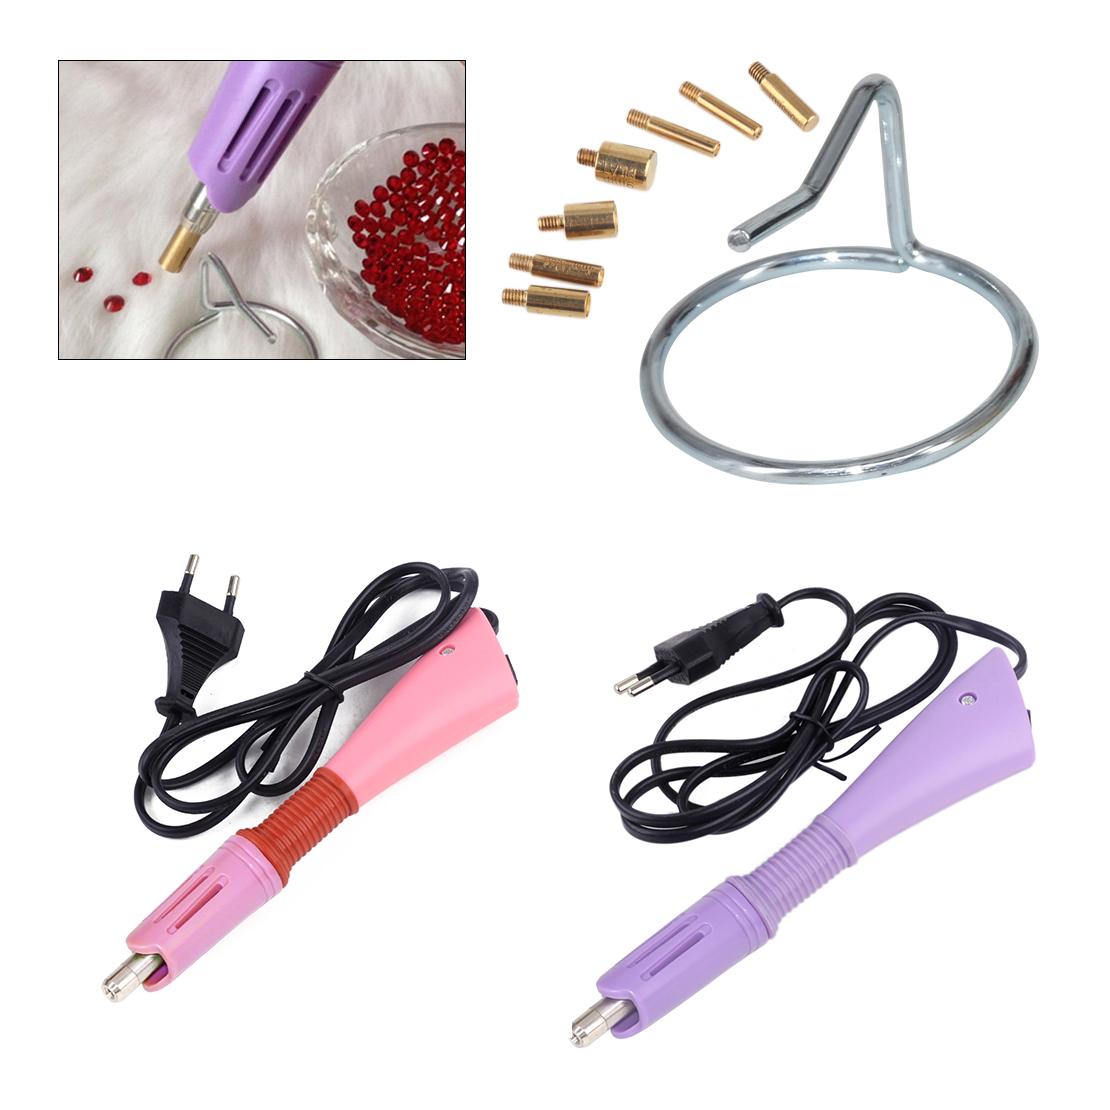 7 in 1 Iron-on Rhinestone Crystal Setter Tool Hot Fix Applicator Wand Pen Useful